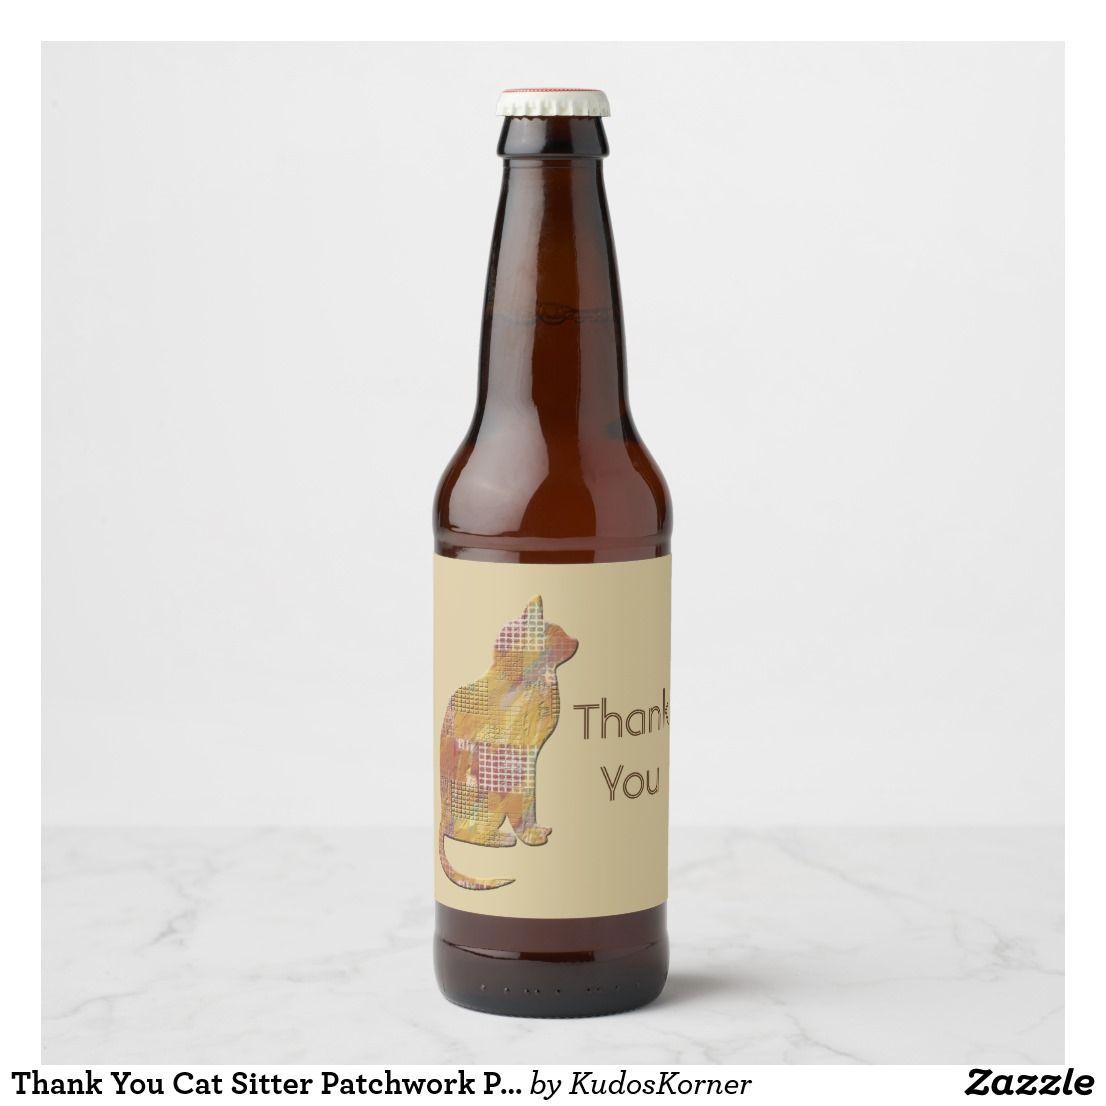 Thank You Cat Sitter Patchwork Pet Appreciation Beer Bottle Label Zazzle Com With Images Patchwork Pet Beer Bottle Labels Cat Sitter